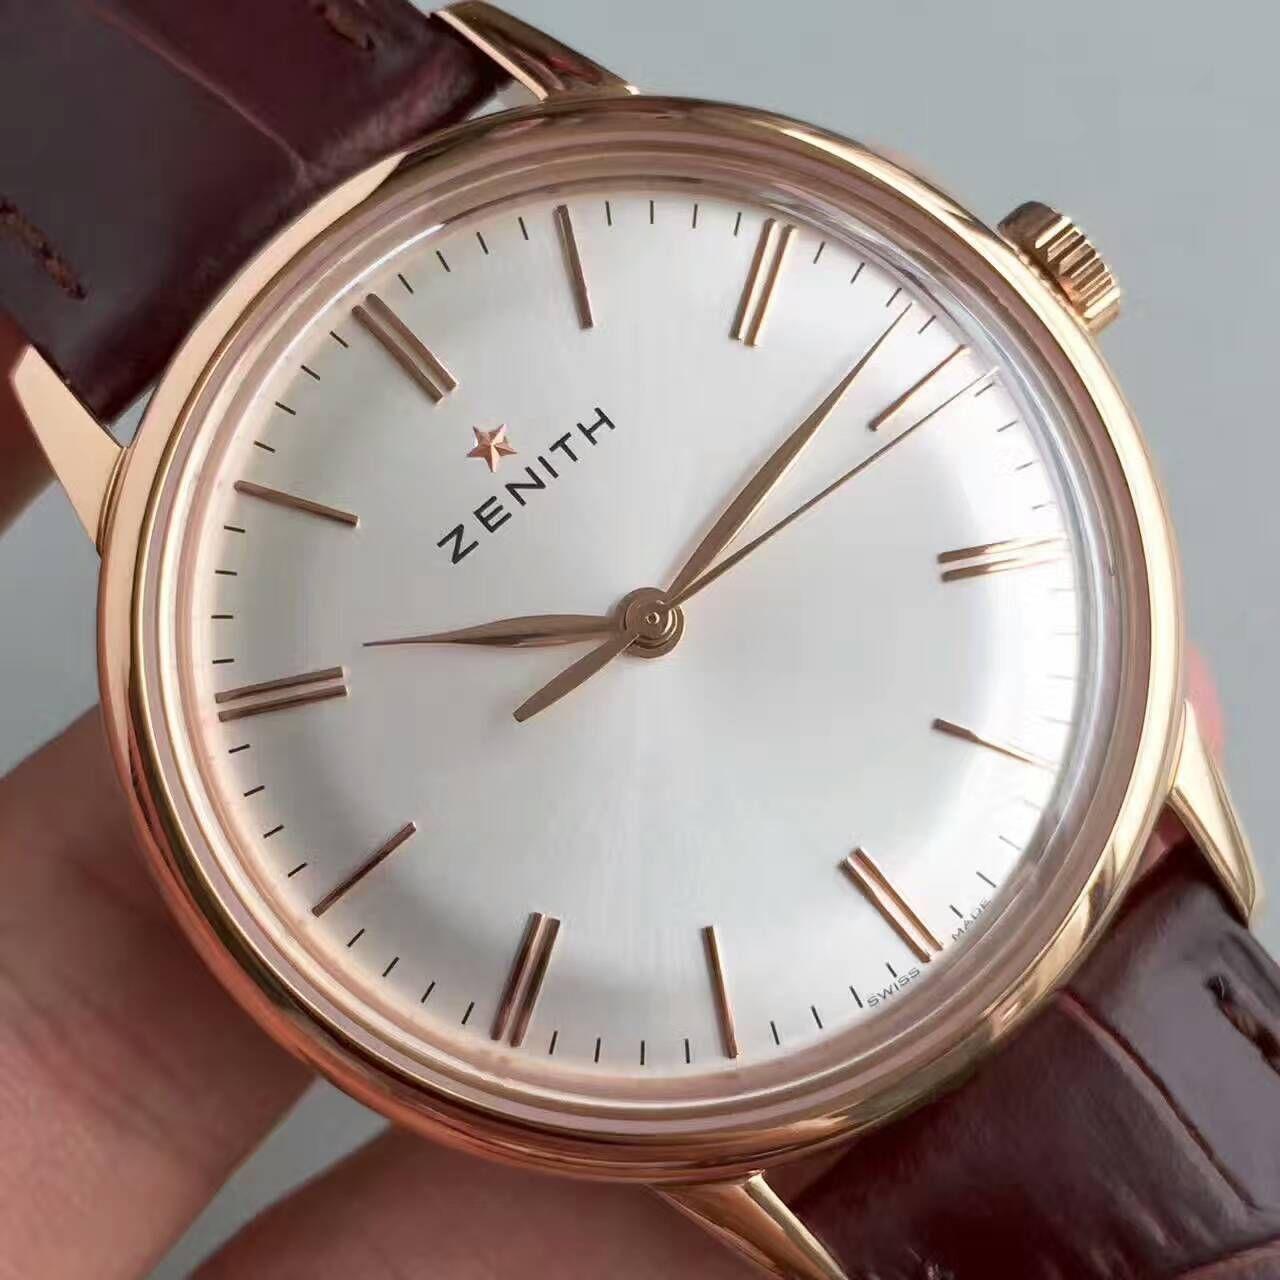 【ND厂一比一复刻手表】真力时ELITE系列18.2270.6150/01.C498腕表 / ZSL031